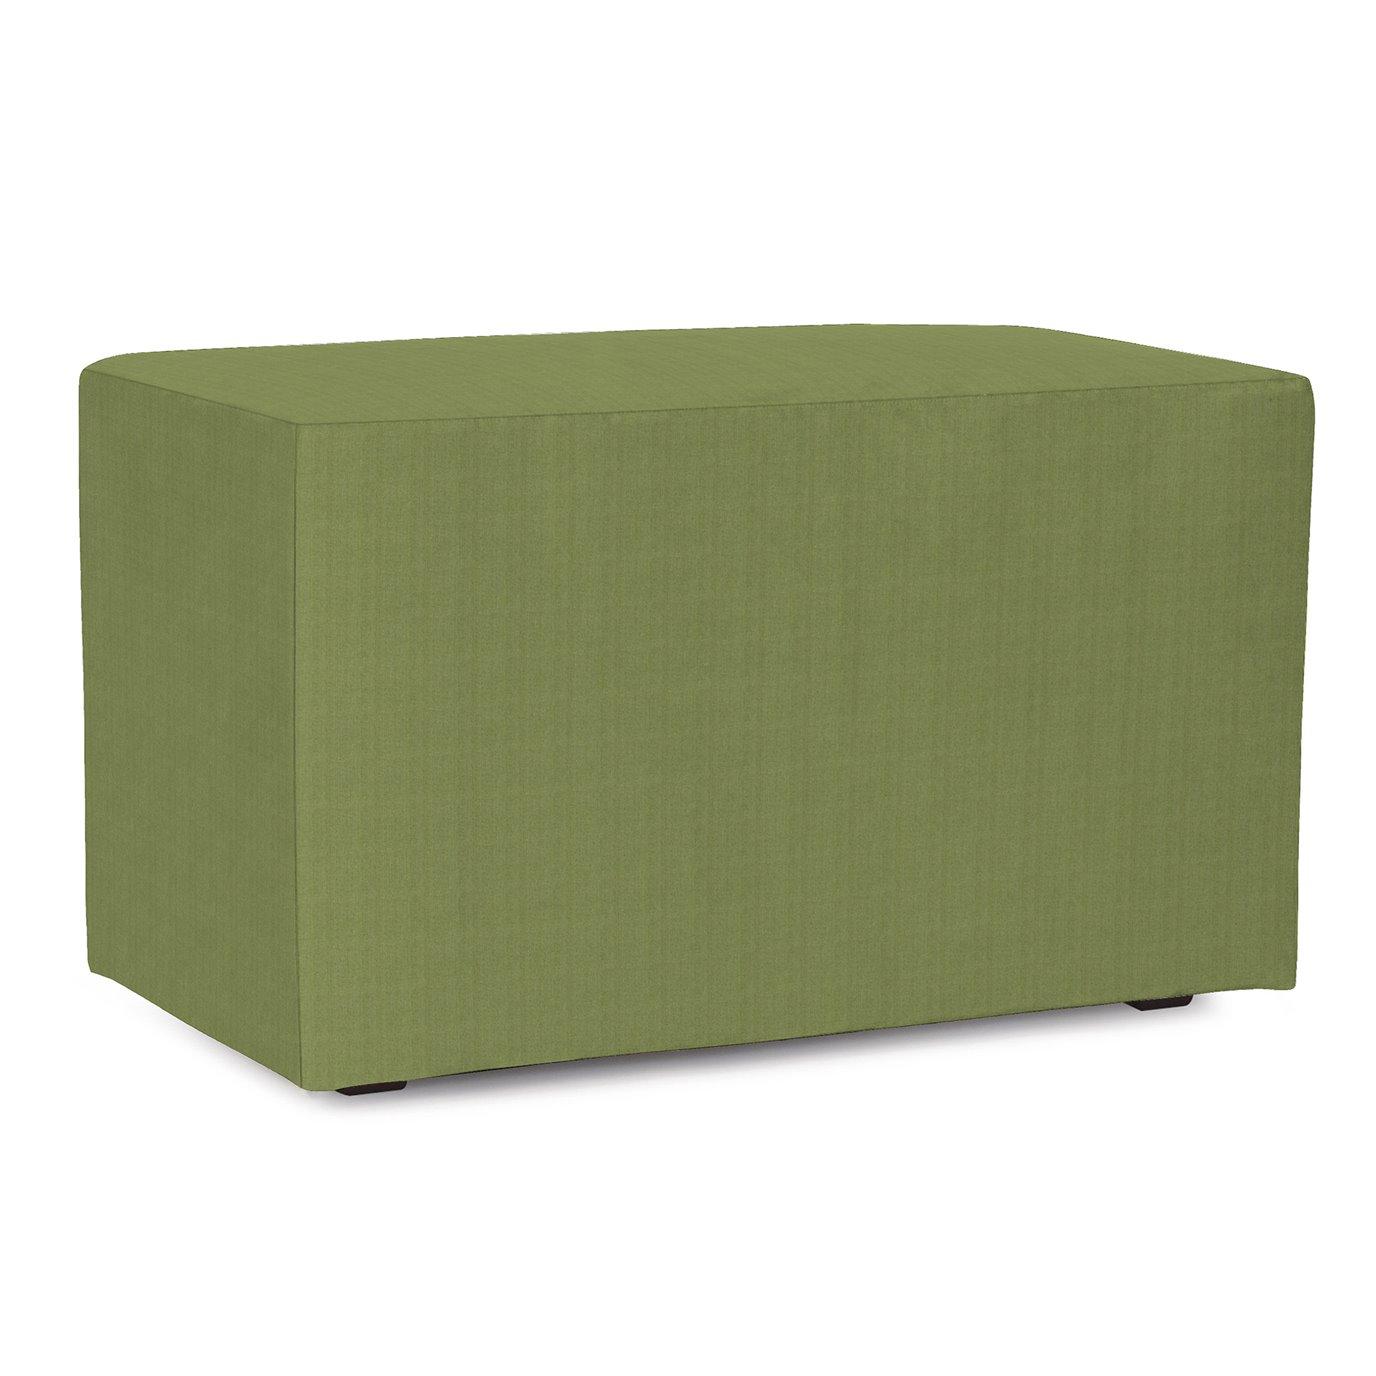 Howard Elliott Universal Bench Outdoor Sunbrella Seascape Moss Complete Ottoman